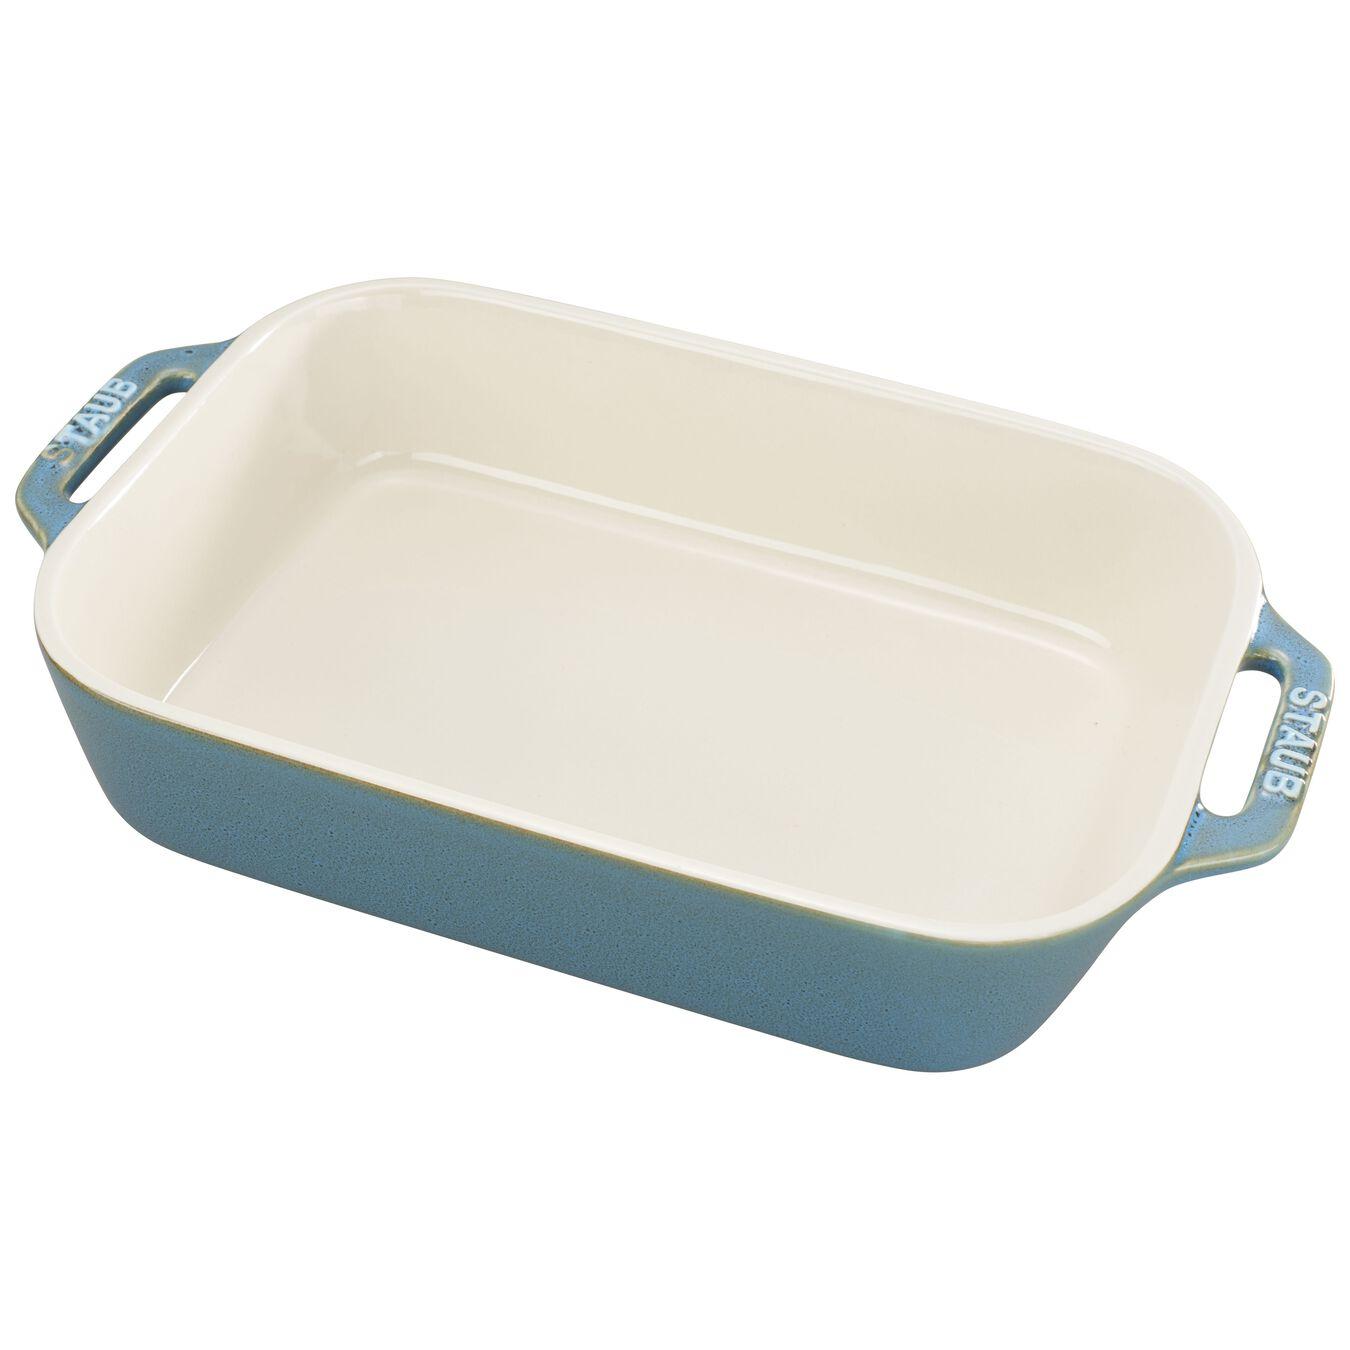 10.5-inch x 7.5-inch Rectangular Baking Dish - Rustic Turquoise,,large 2